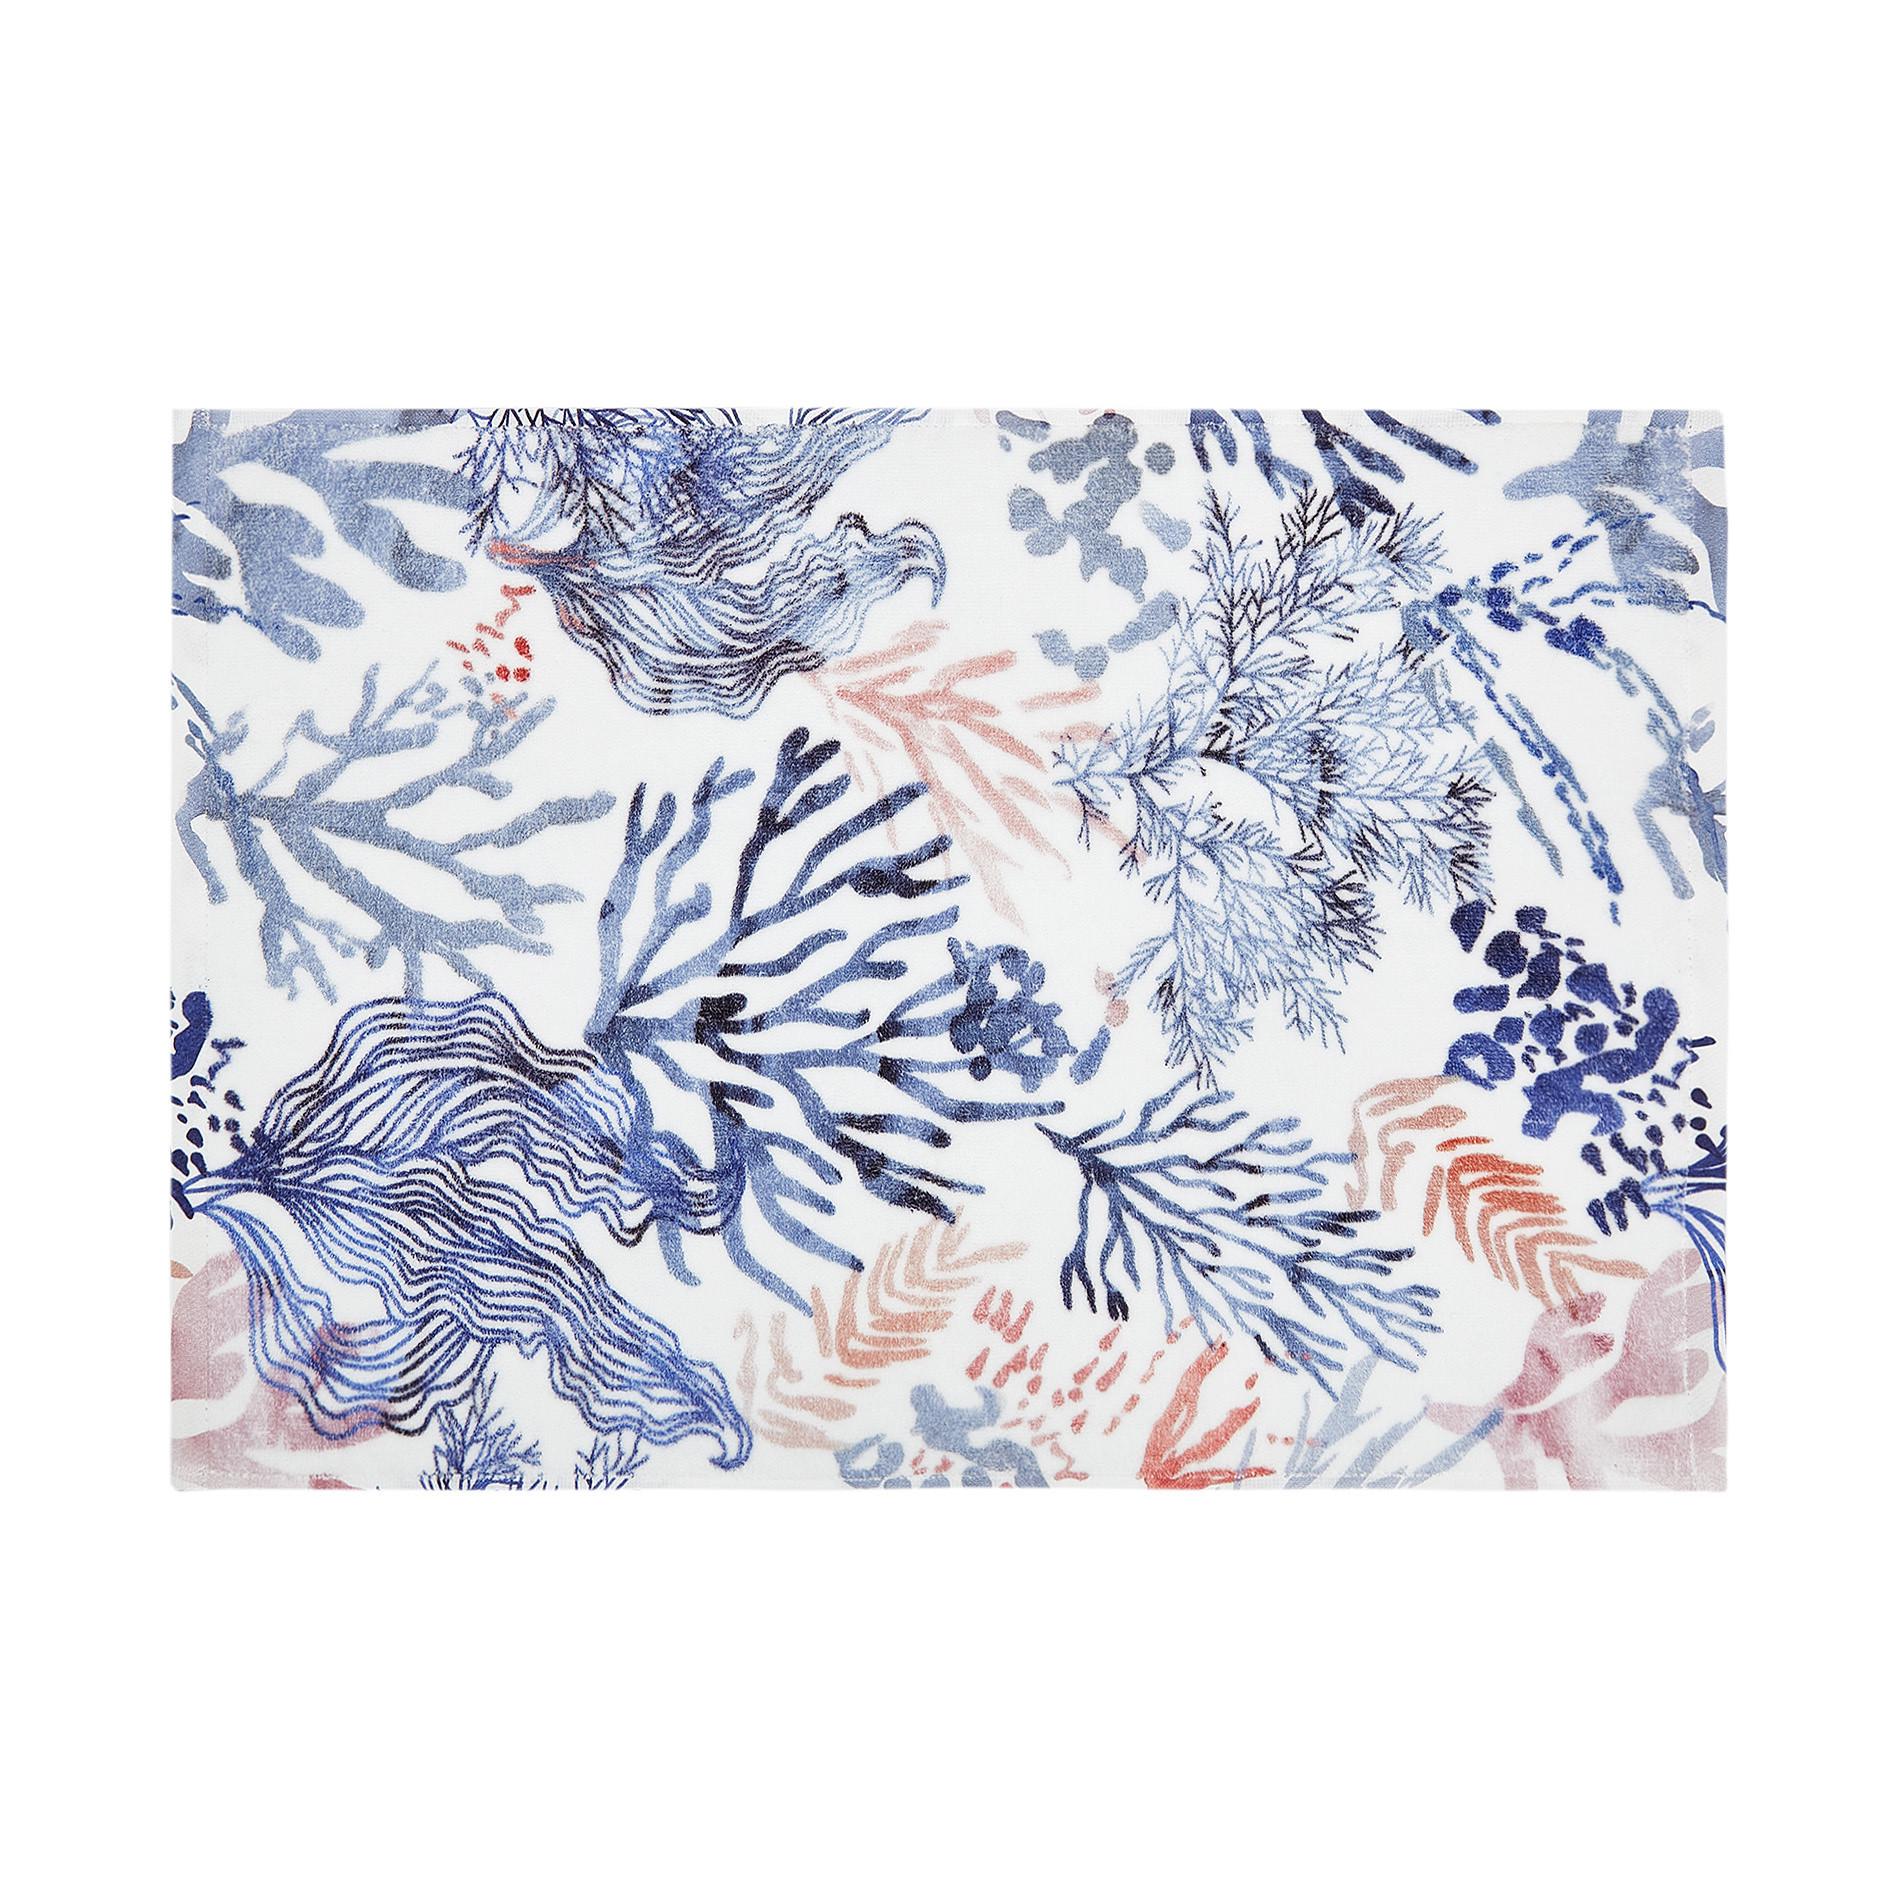 Asciugamano cotone velour stampa coralli, Bianco, large image number 1